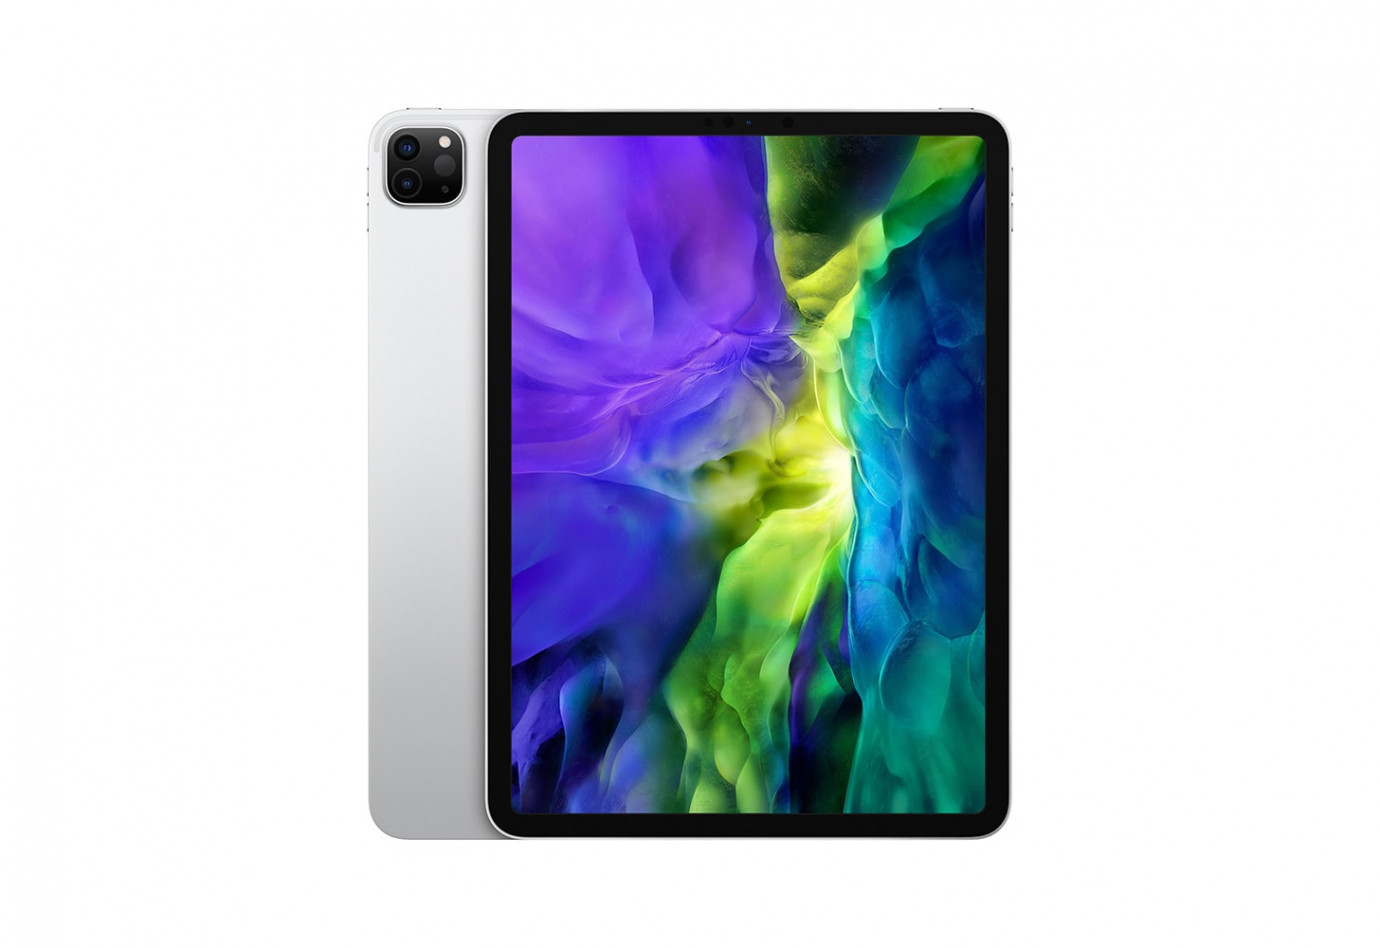 https://dpyxfisjd0mft.cloudfront.net/lab9-2/2019/Products/Apple/iPad%20Pro%202020/ipadpro-11-wifi-s-1.jpg?1585078206&w=1456&h=1000